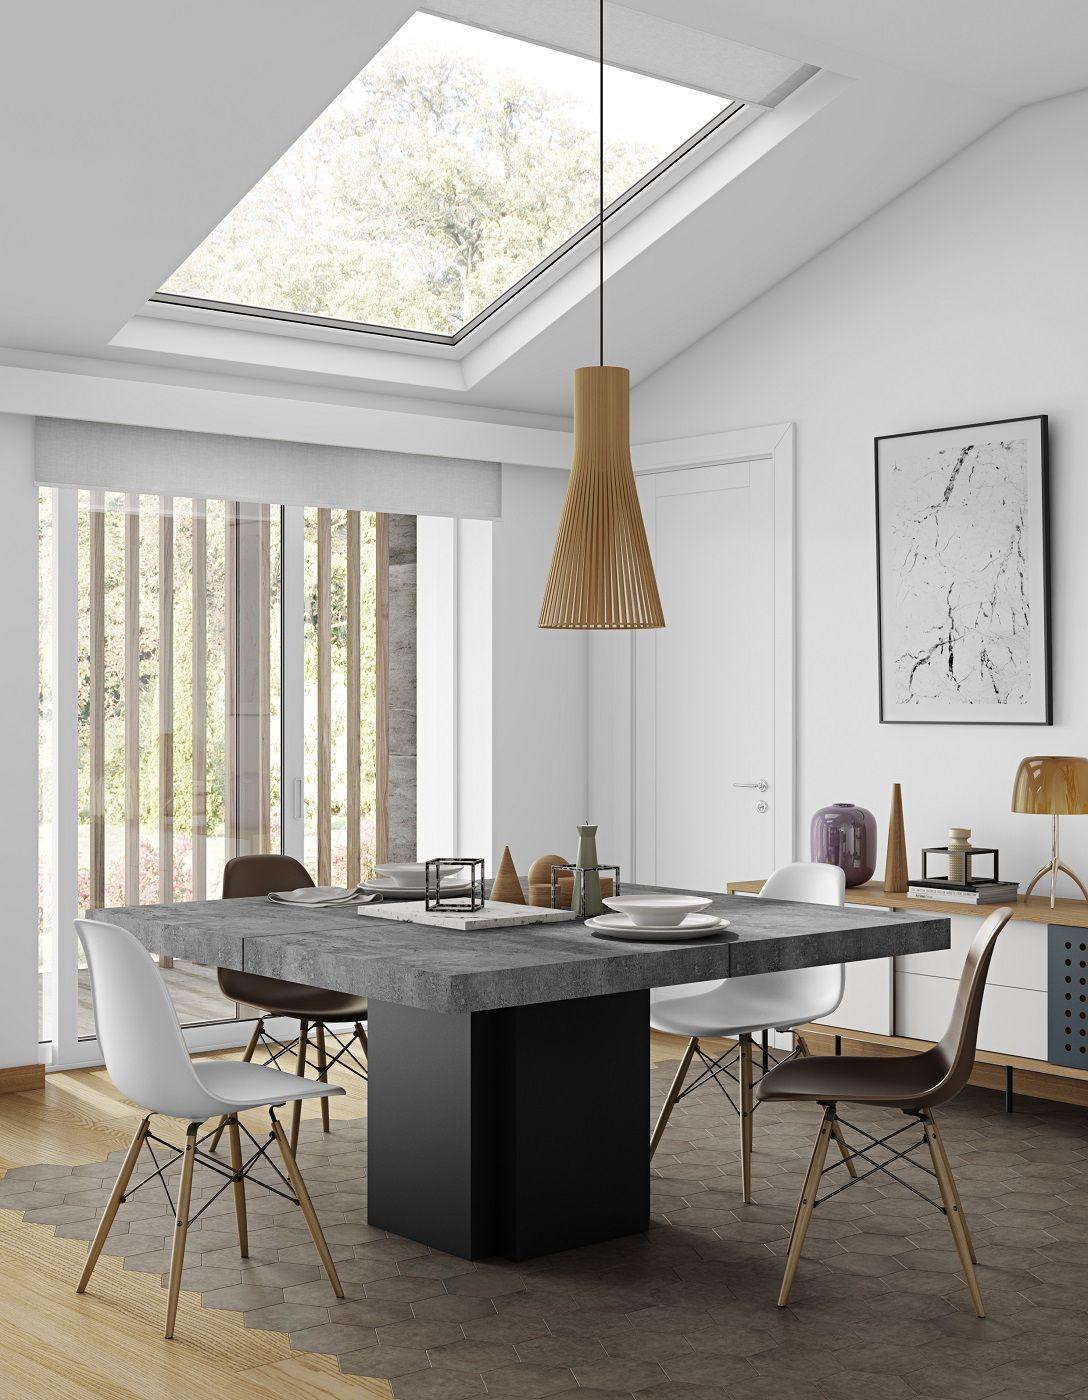 Dusk Spisebord - 130x130 cm - Stilrent spisebord i grå m. central fod